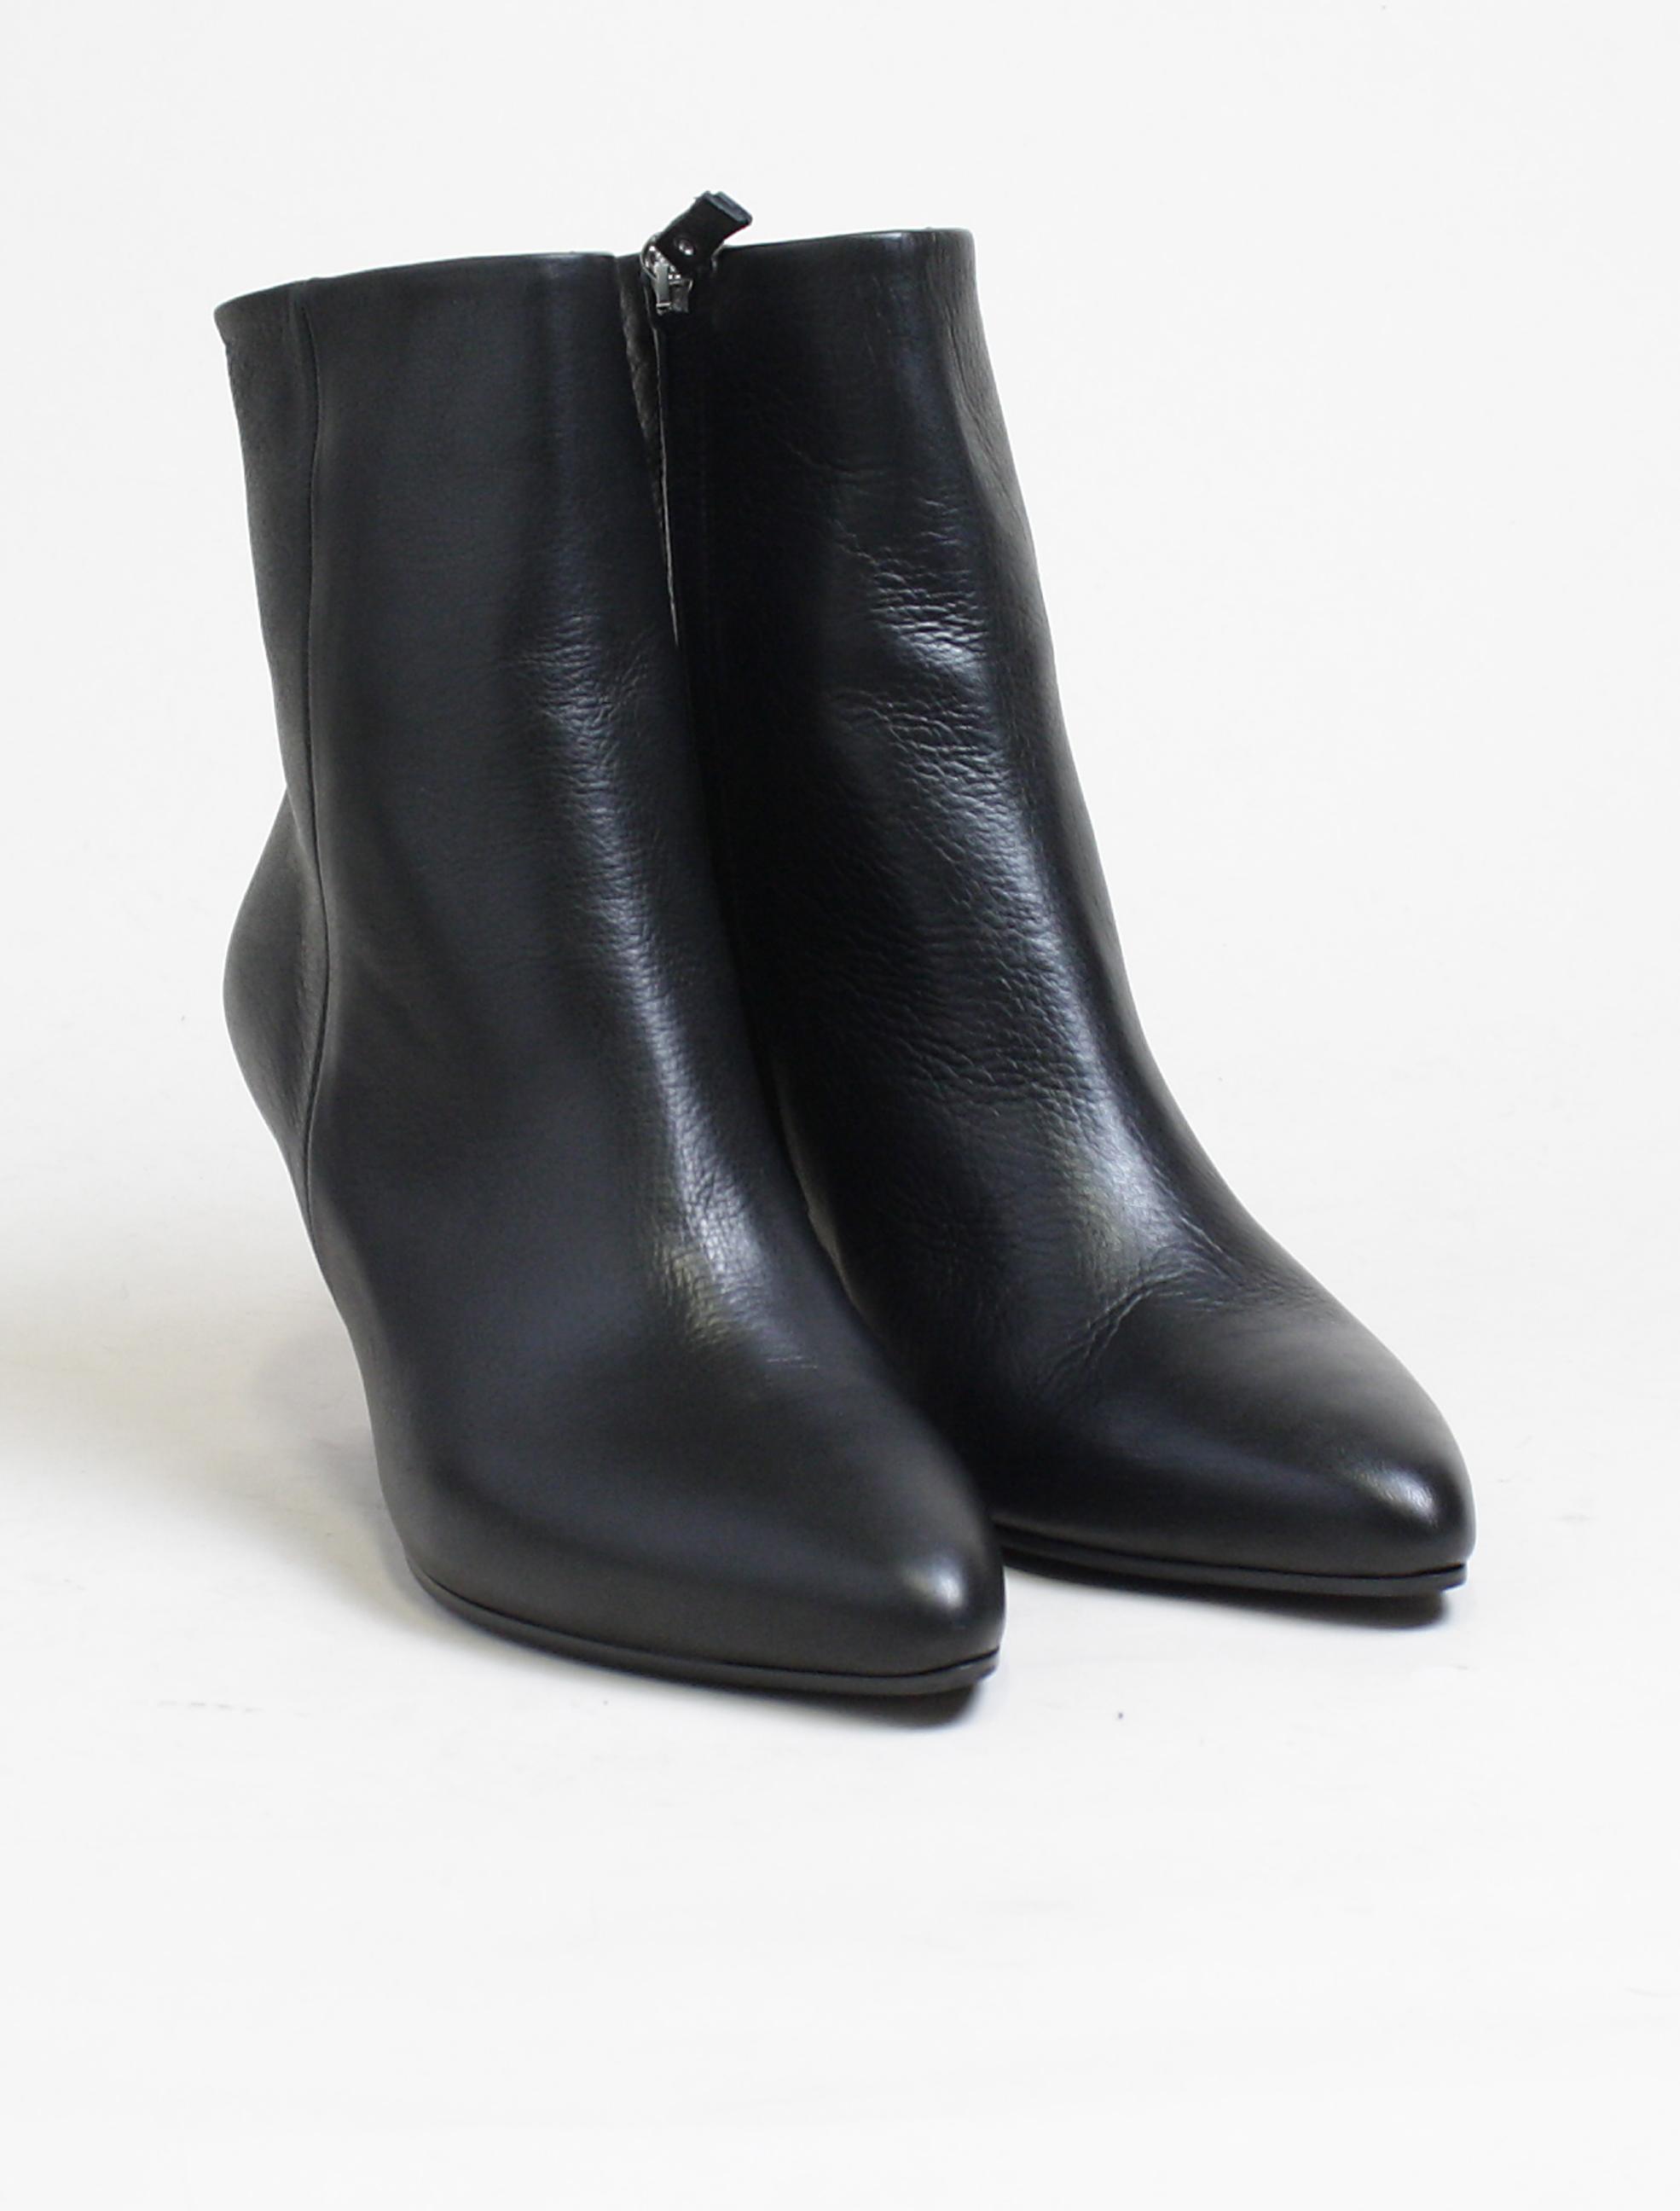 2018 sneakers buy popular good looking Vic Matié black glove ankle boot